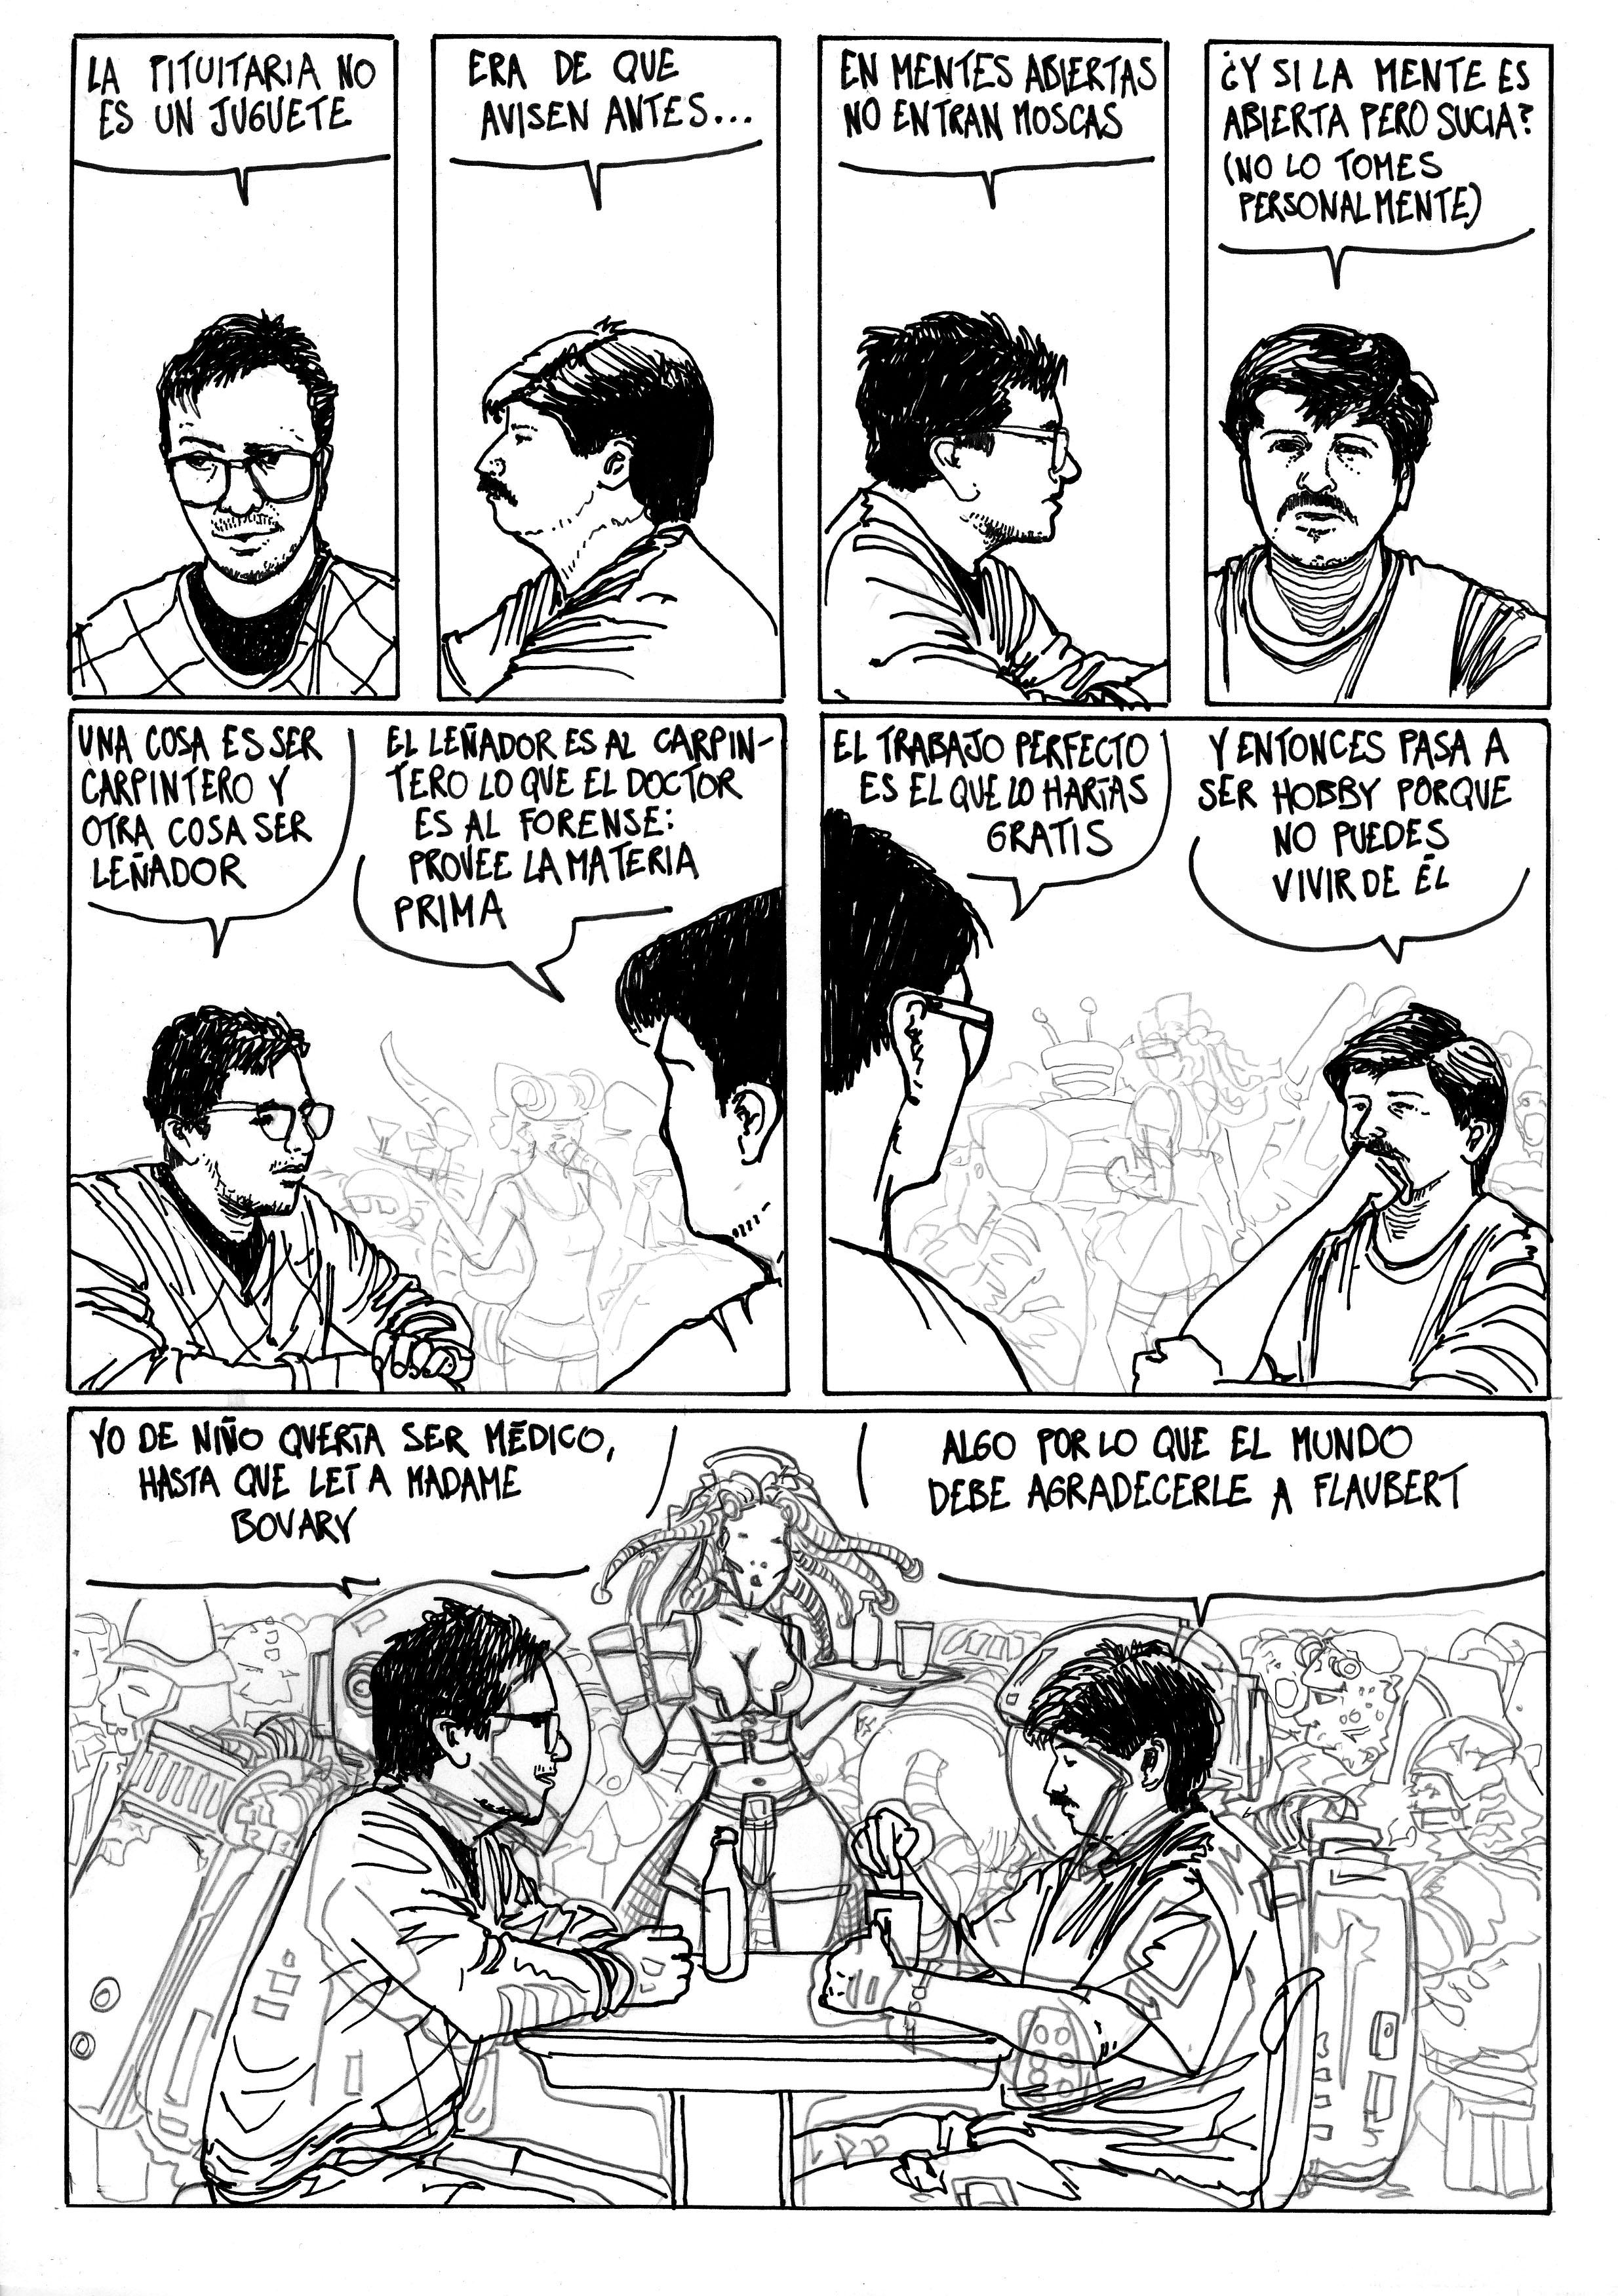 Comic: Fabián Patinho